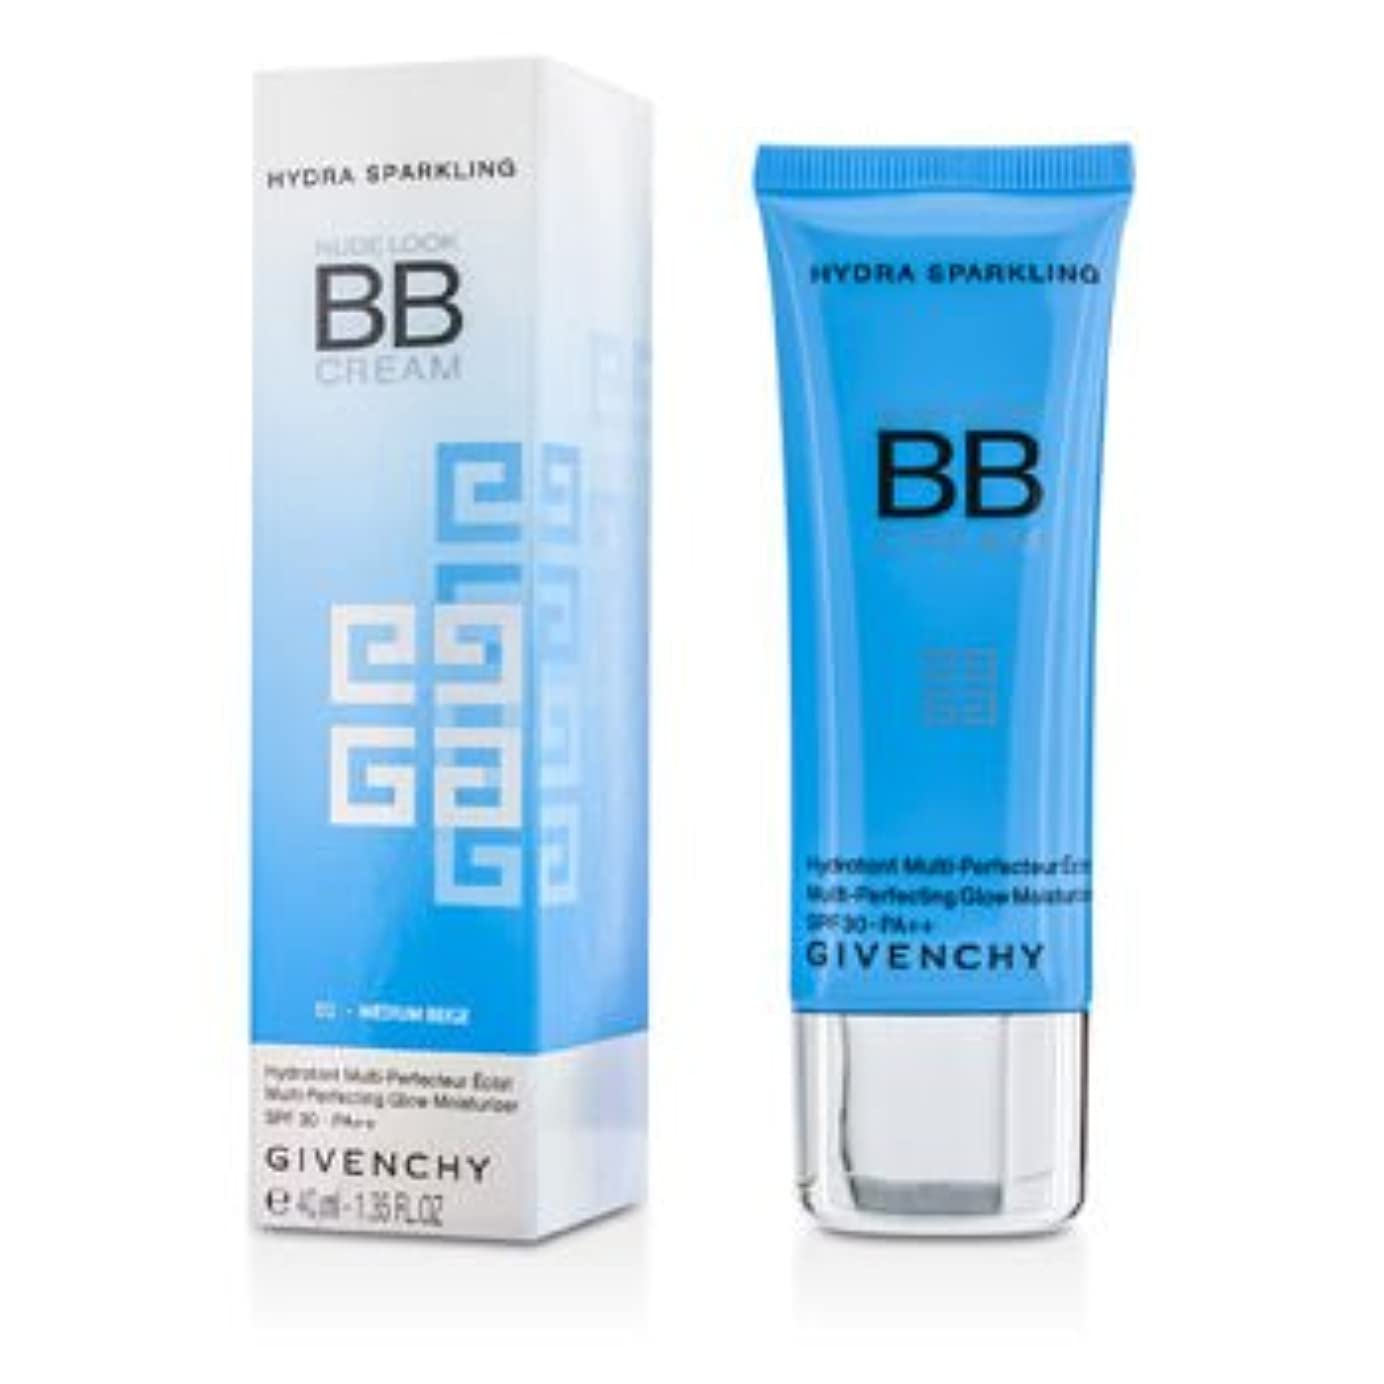 不機嫌座標仲介者[Givenchy] Nude Look BB Cream Multi-Perfecting Glow Moisturizer SPF 30 PA++ #02 Medium Beige 40ml/1.35oz